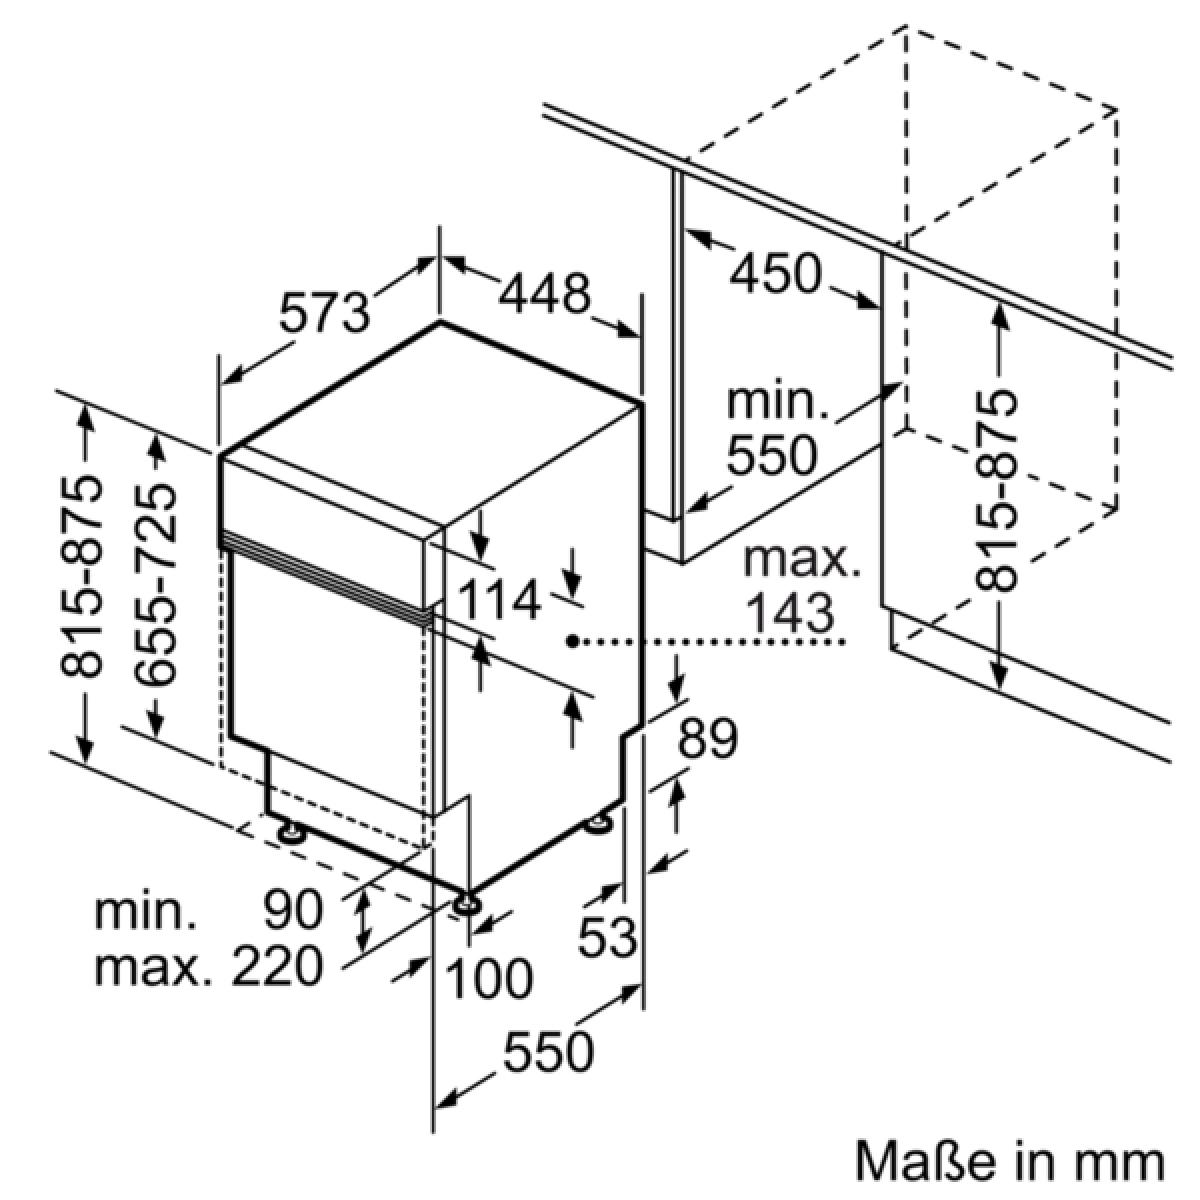 neff gk2502cn s481c50s3e geschirrsp ler 45 cm integrierbar edelstahl 46db a g nstig kaufen. Black Bedroom Furniture Sets. Home Design Ideas